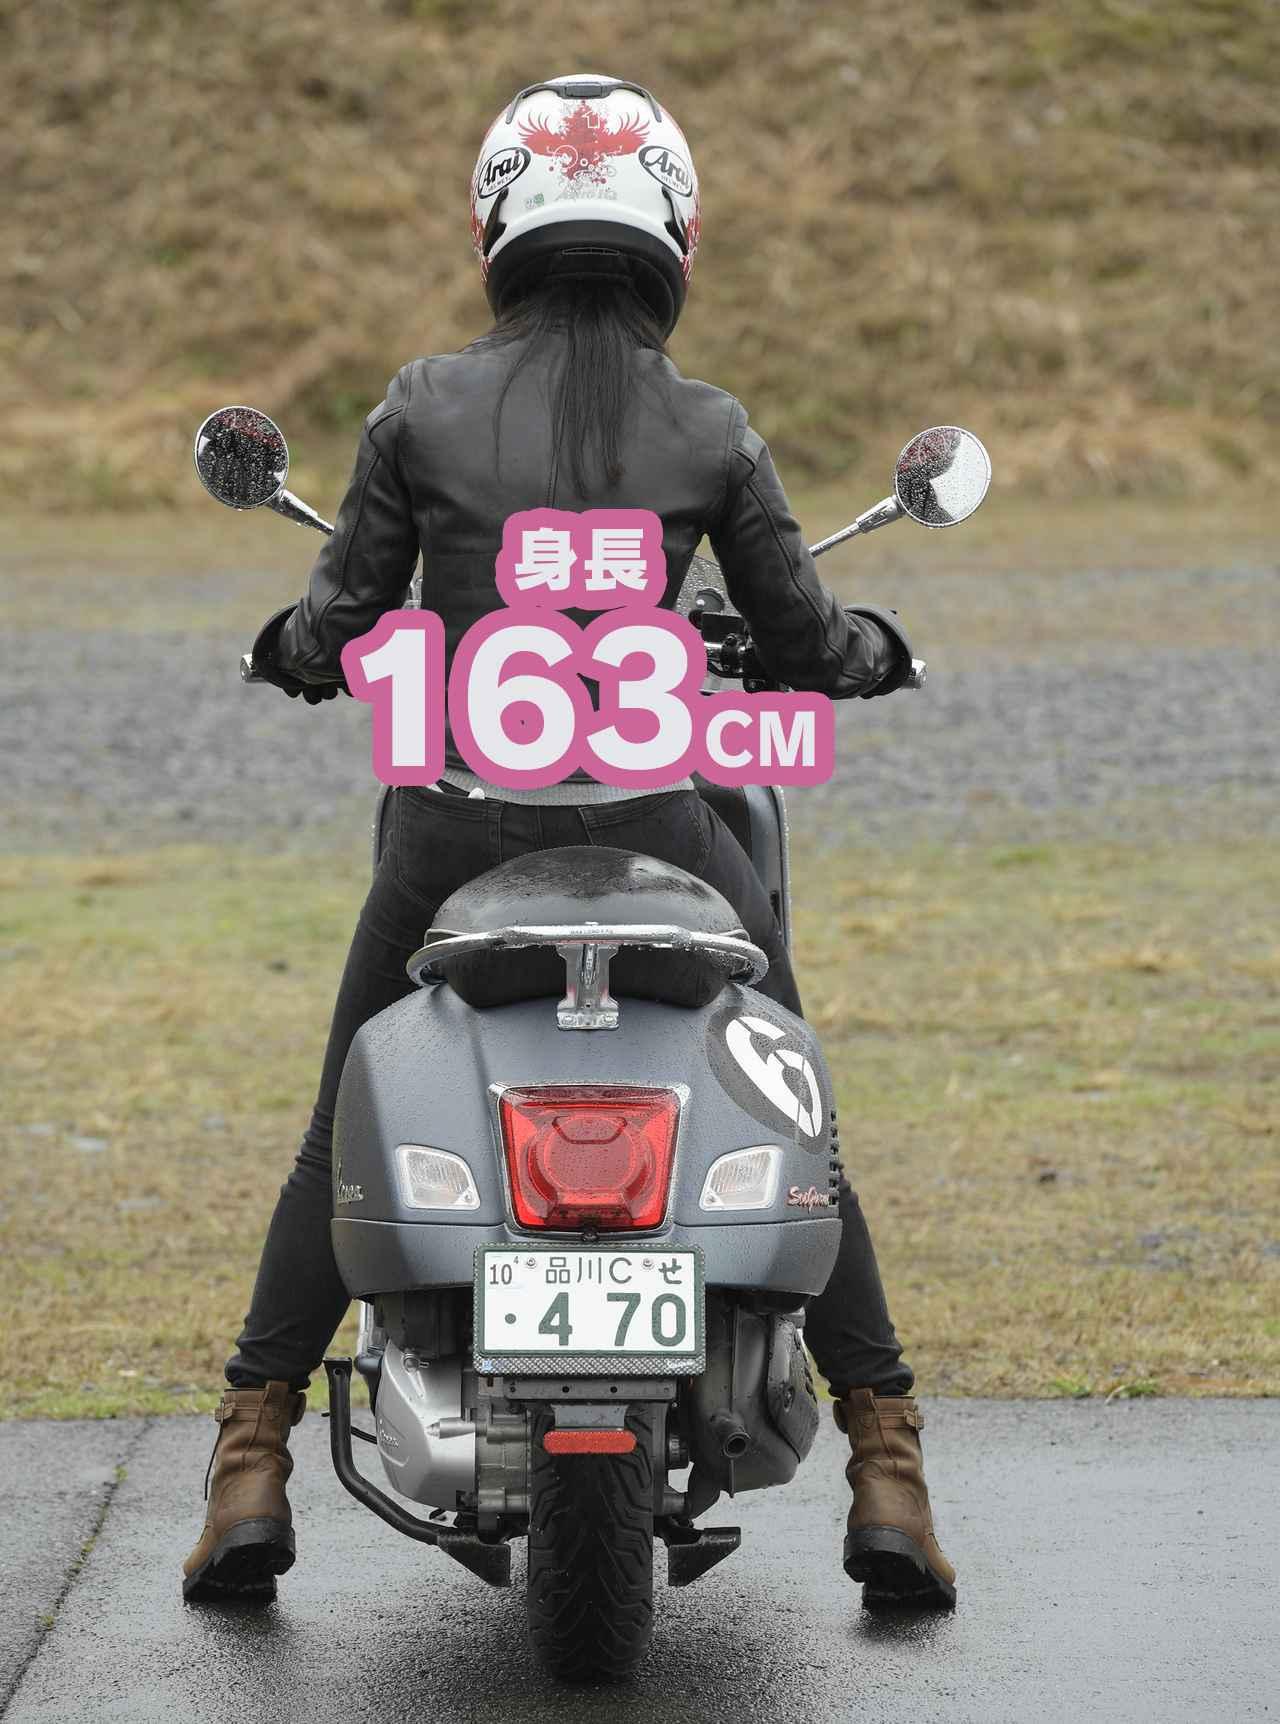 Images : 5番目の画像 - 身長別/ライポジ&足つきチェック - webオートバイ